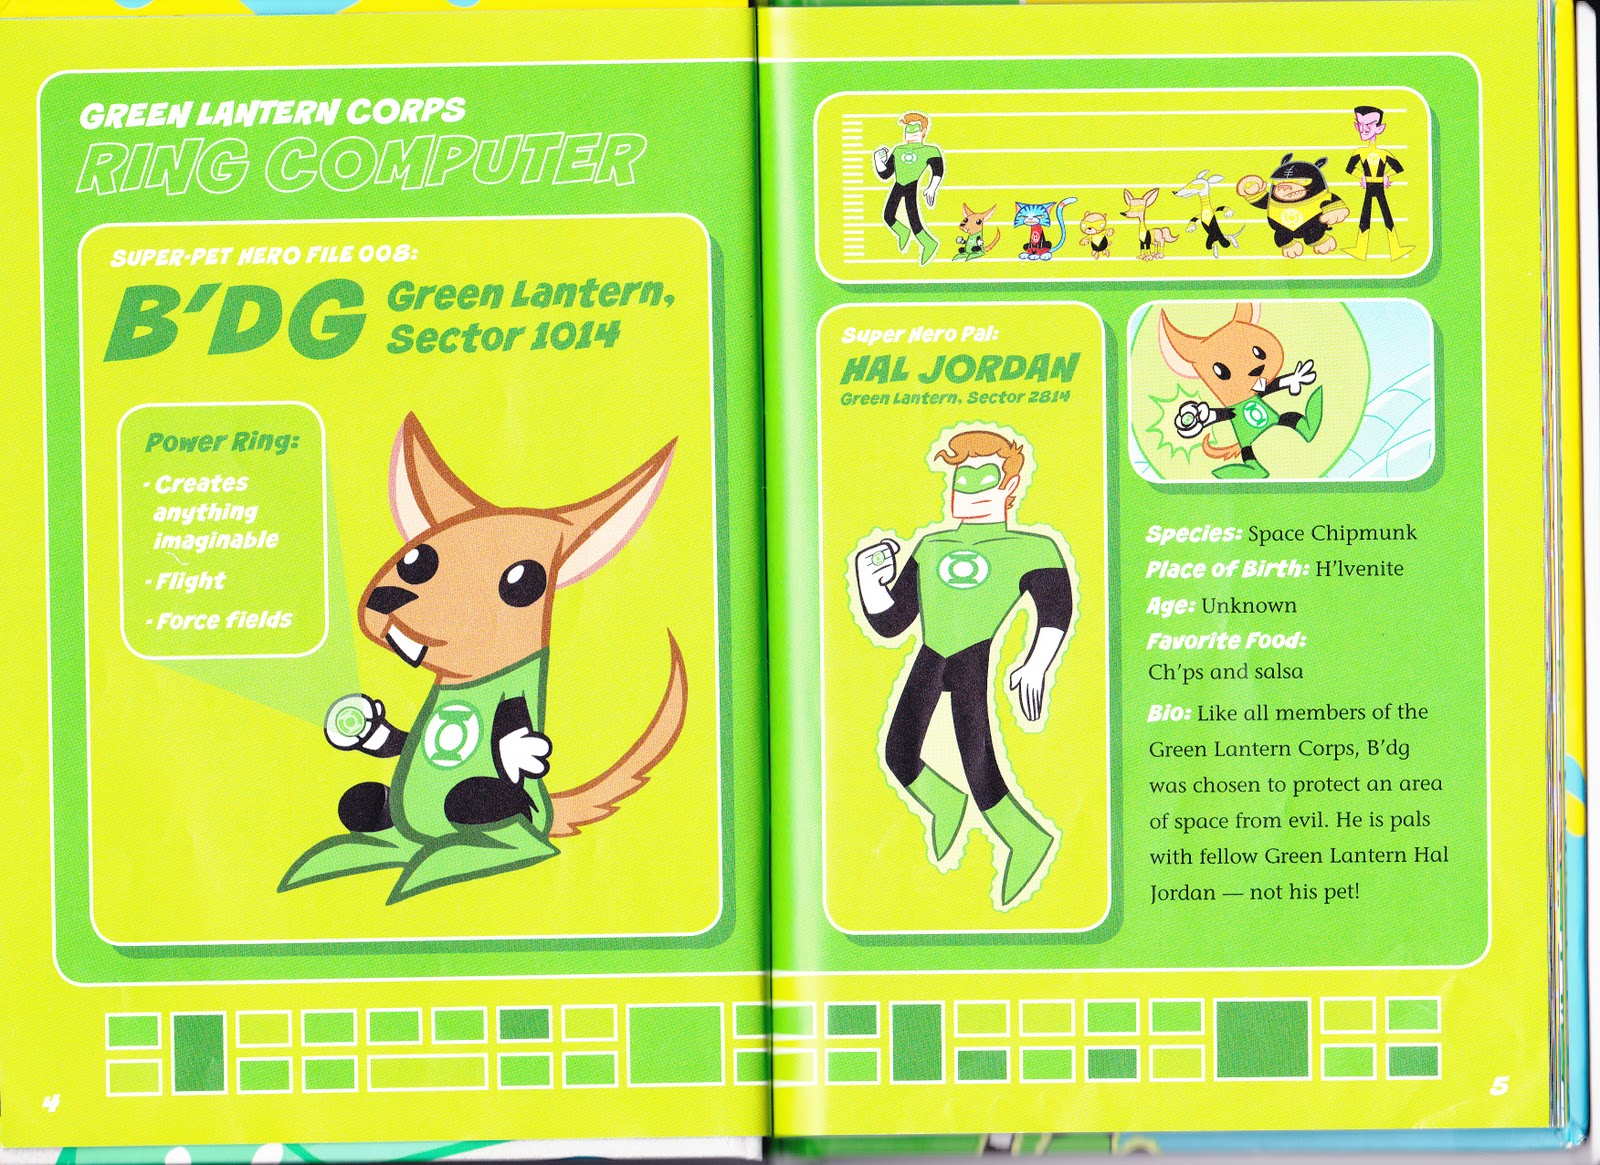 Pixelated Panels B Dg The Cannibal Green Lantern